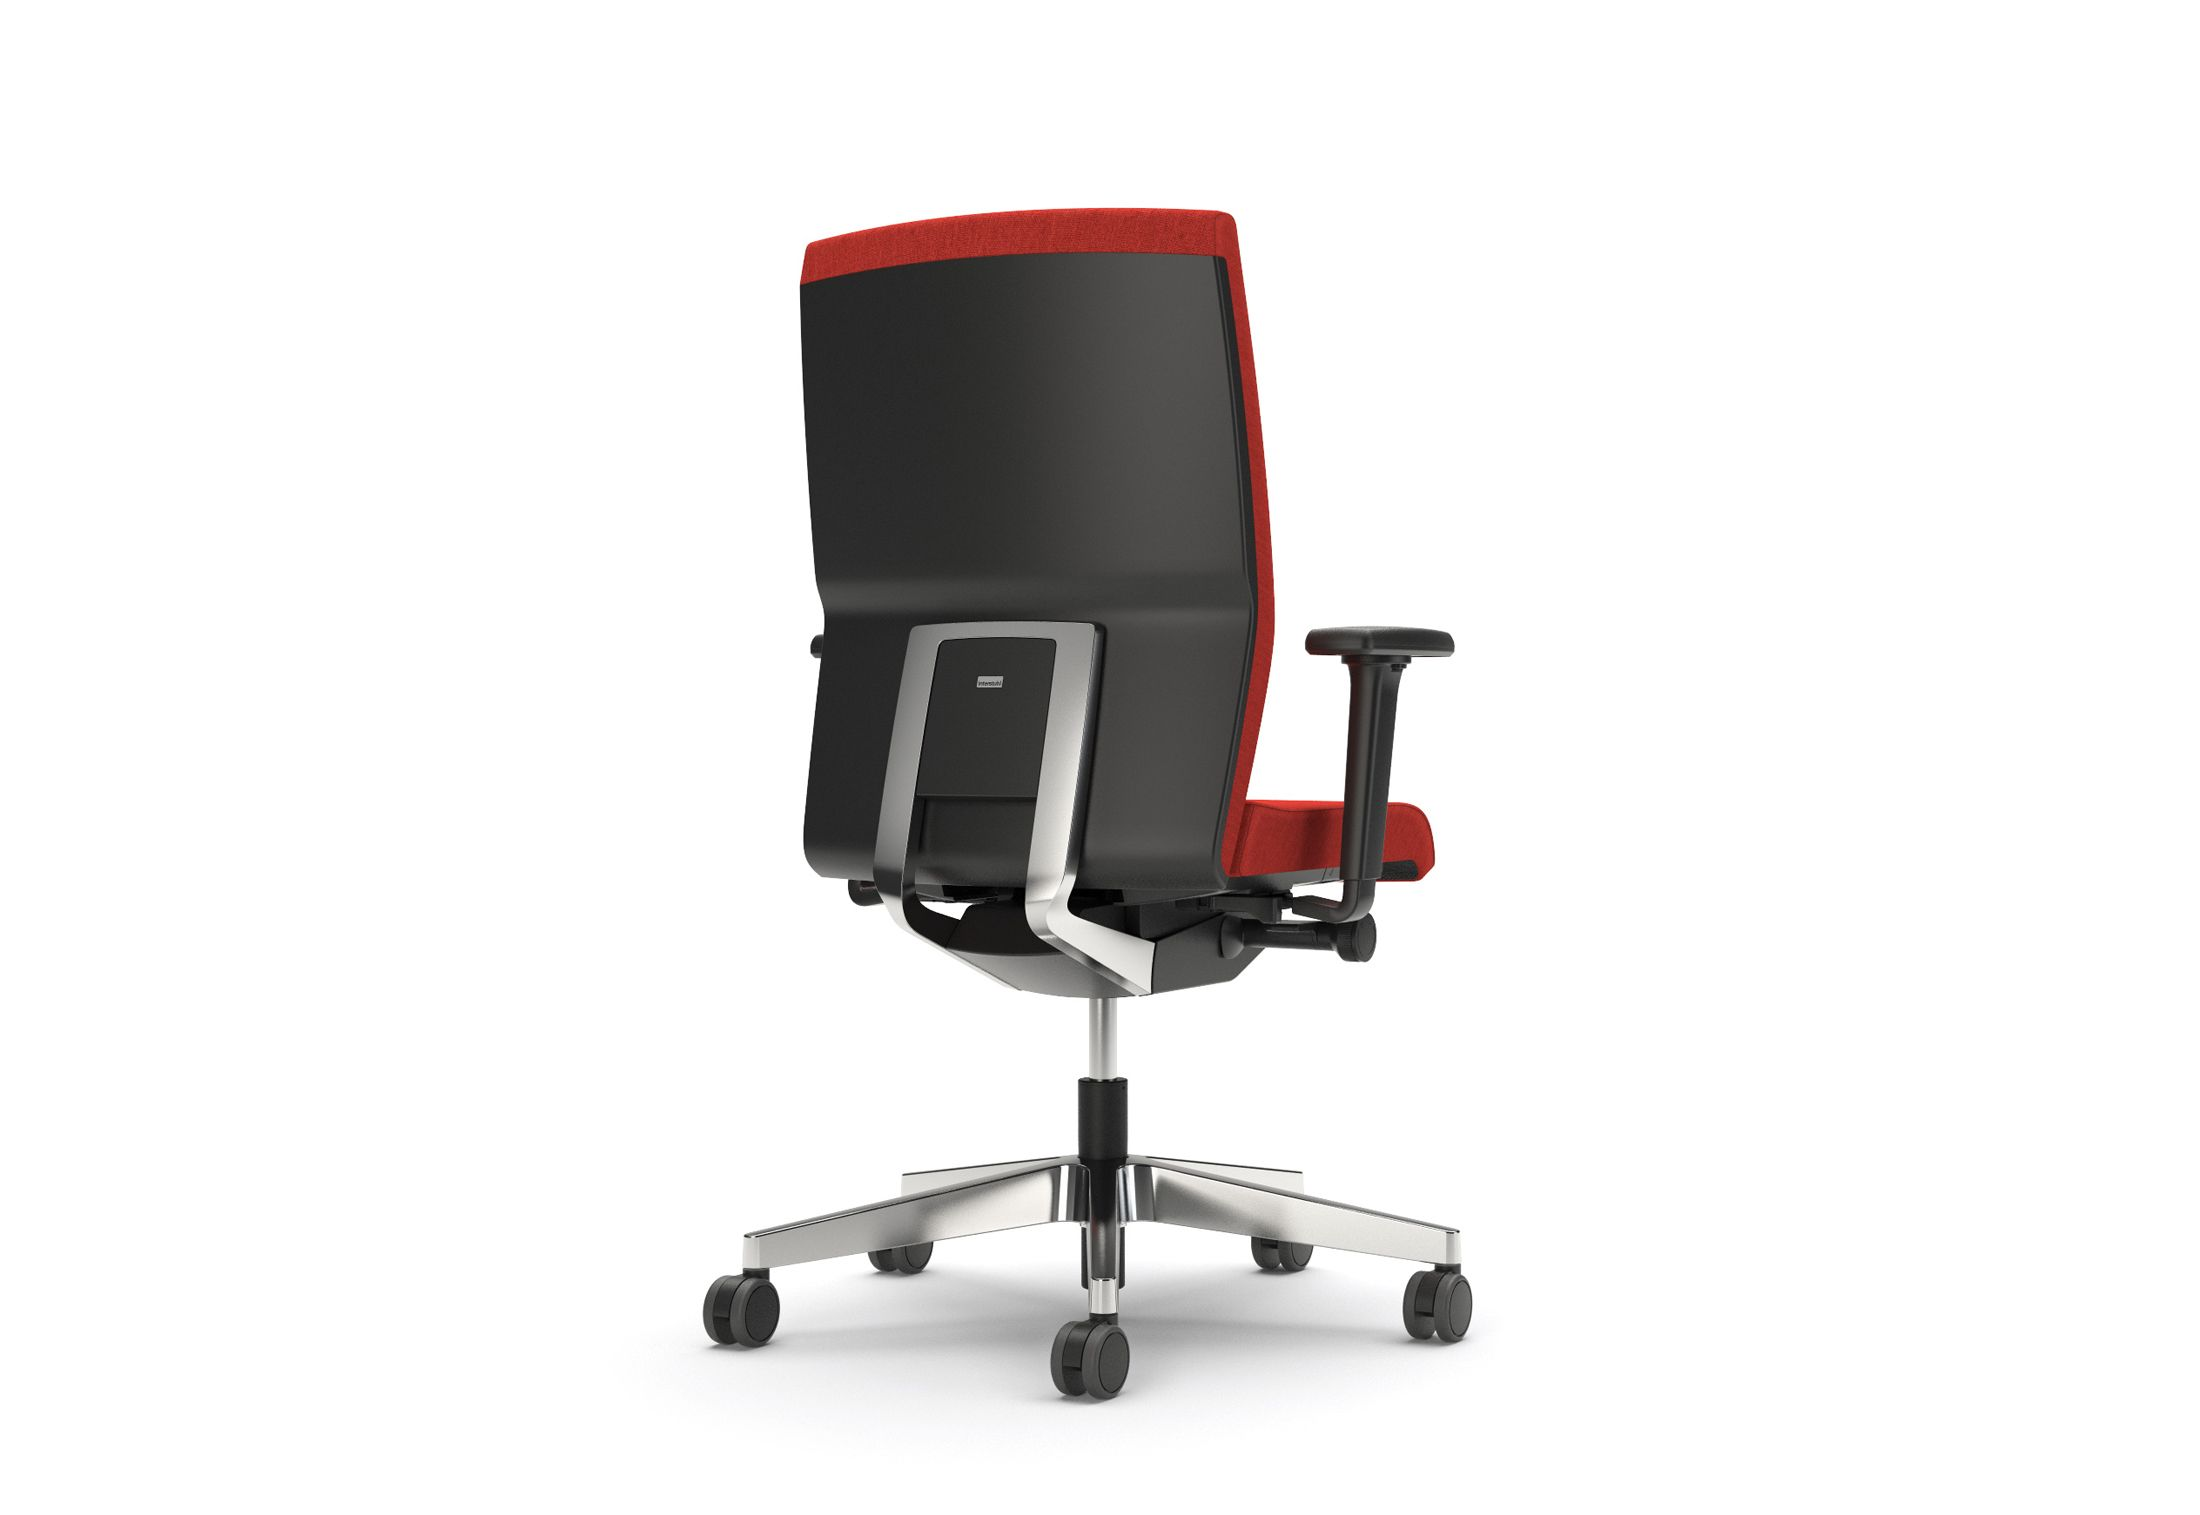 Yosteris3 By Interstuhl Swivel Office Chair Chair Swivel Chair